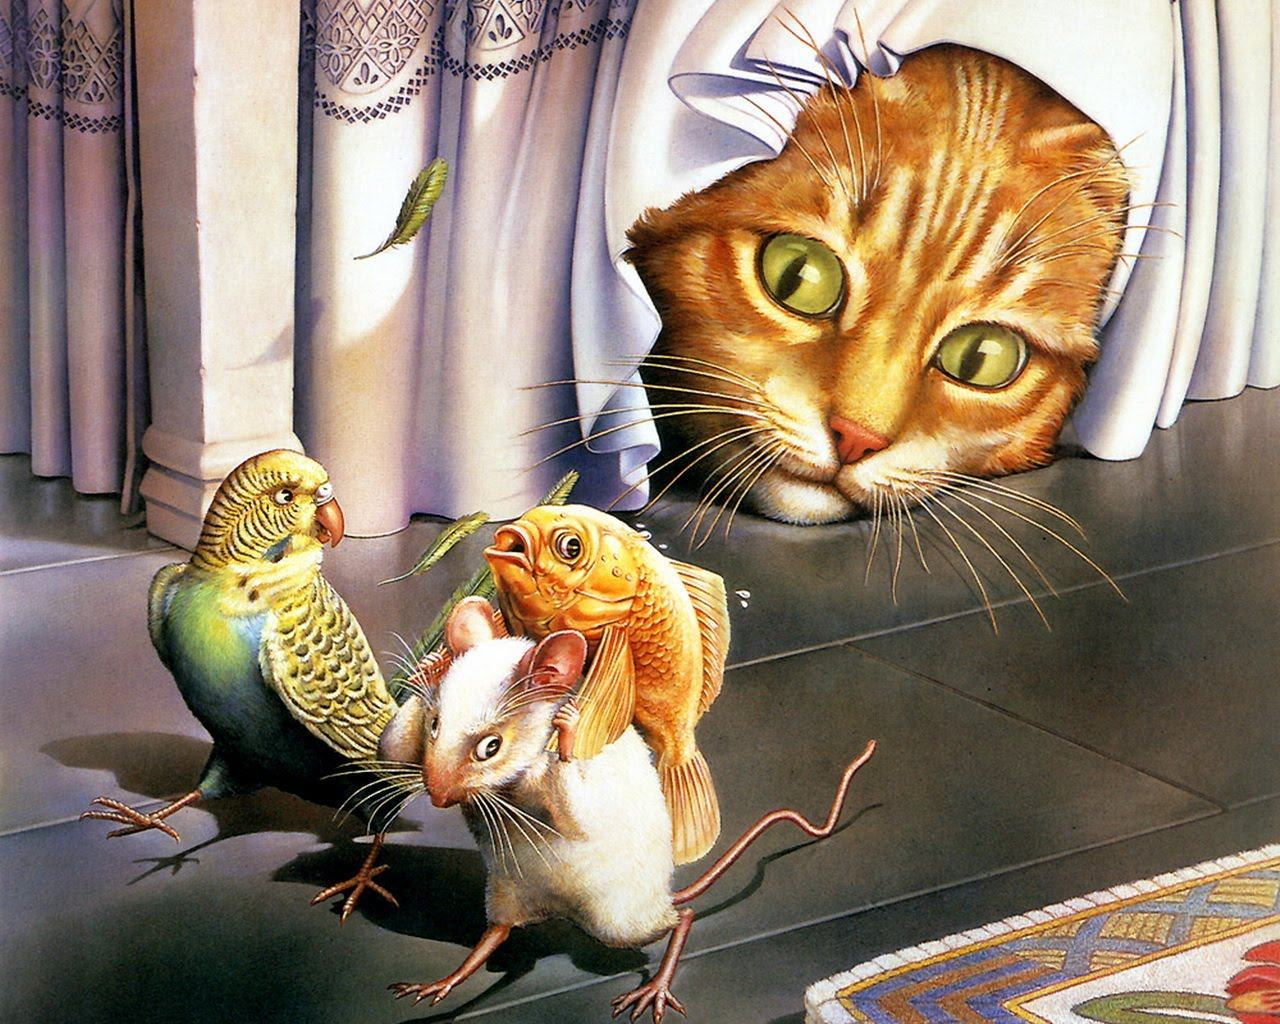 http://2.bp.blogspot.com/_GhlVI6dsgG8/TNA6WhR9XbI/AAAAAAAABG8/lWEK9CvyIu4/s1600/cat+wallpaper.jpg